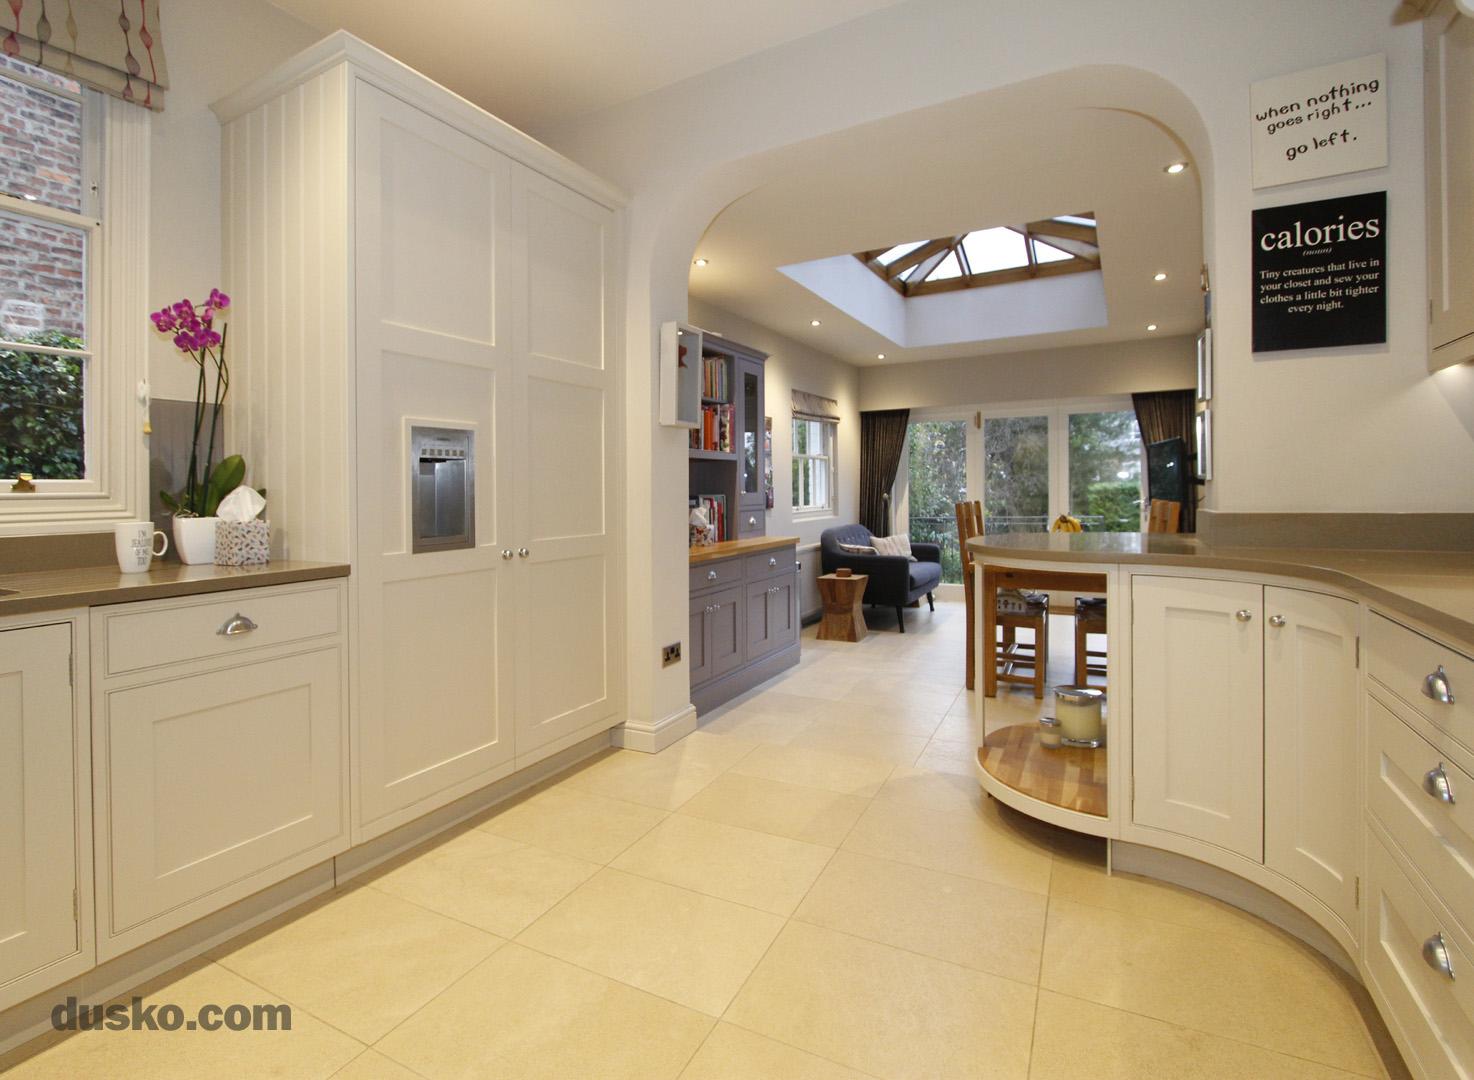 In Frame Kitchen in Bowdon, Cheshire Integrated Fridge Freezer